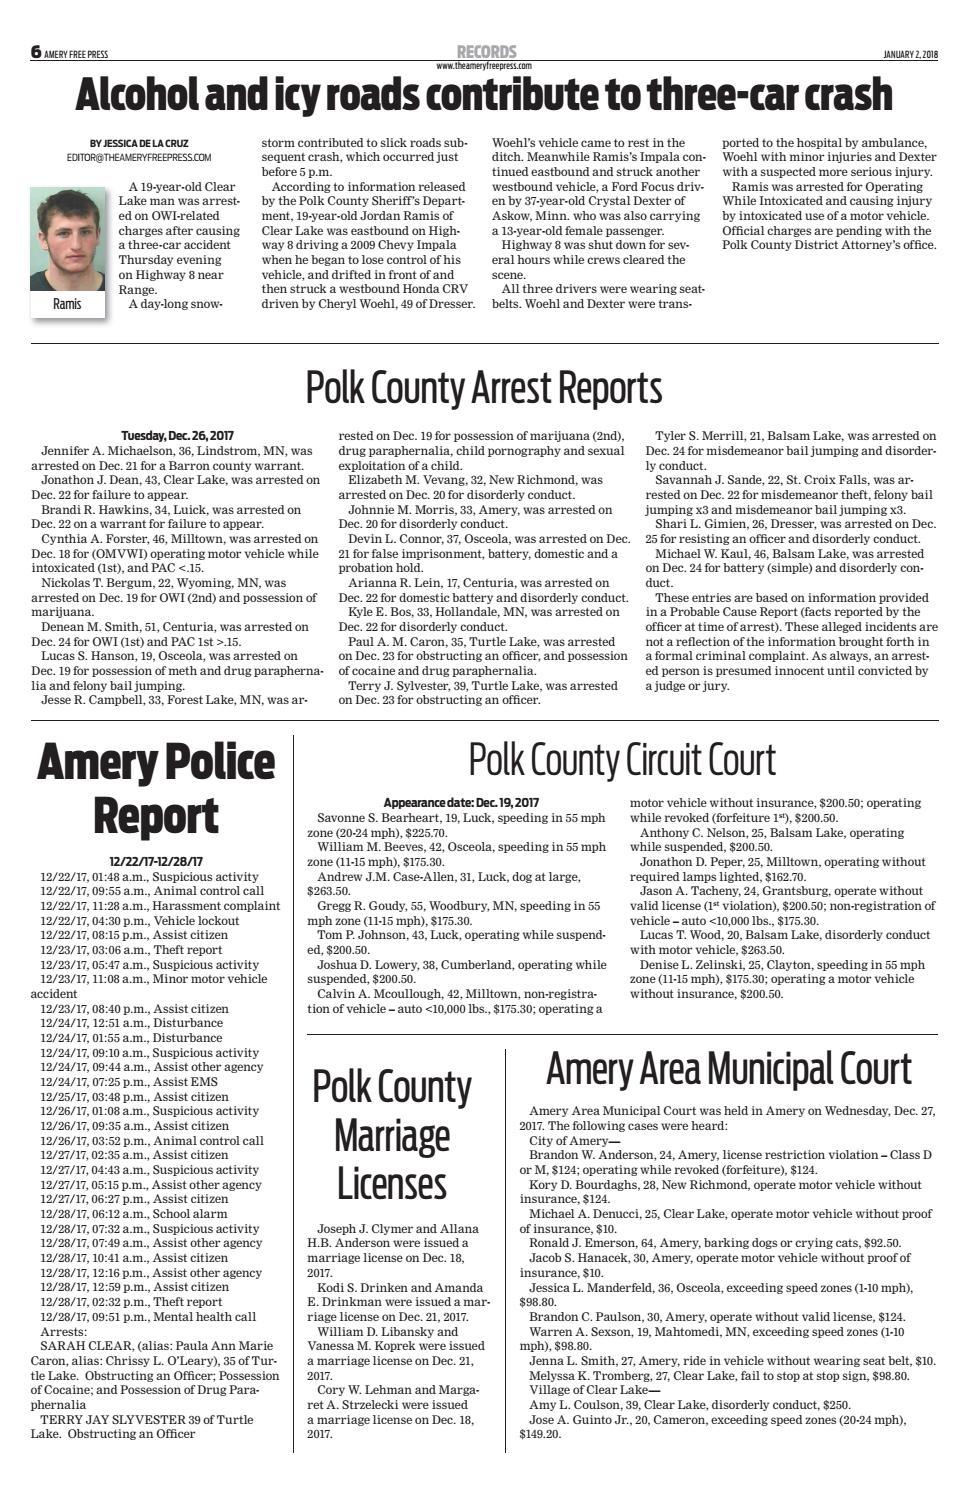 Afp 01 02 18 by Amery Free Press - issuu